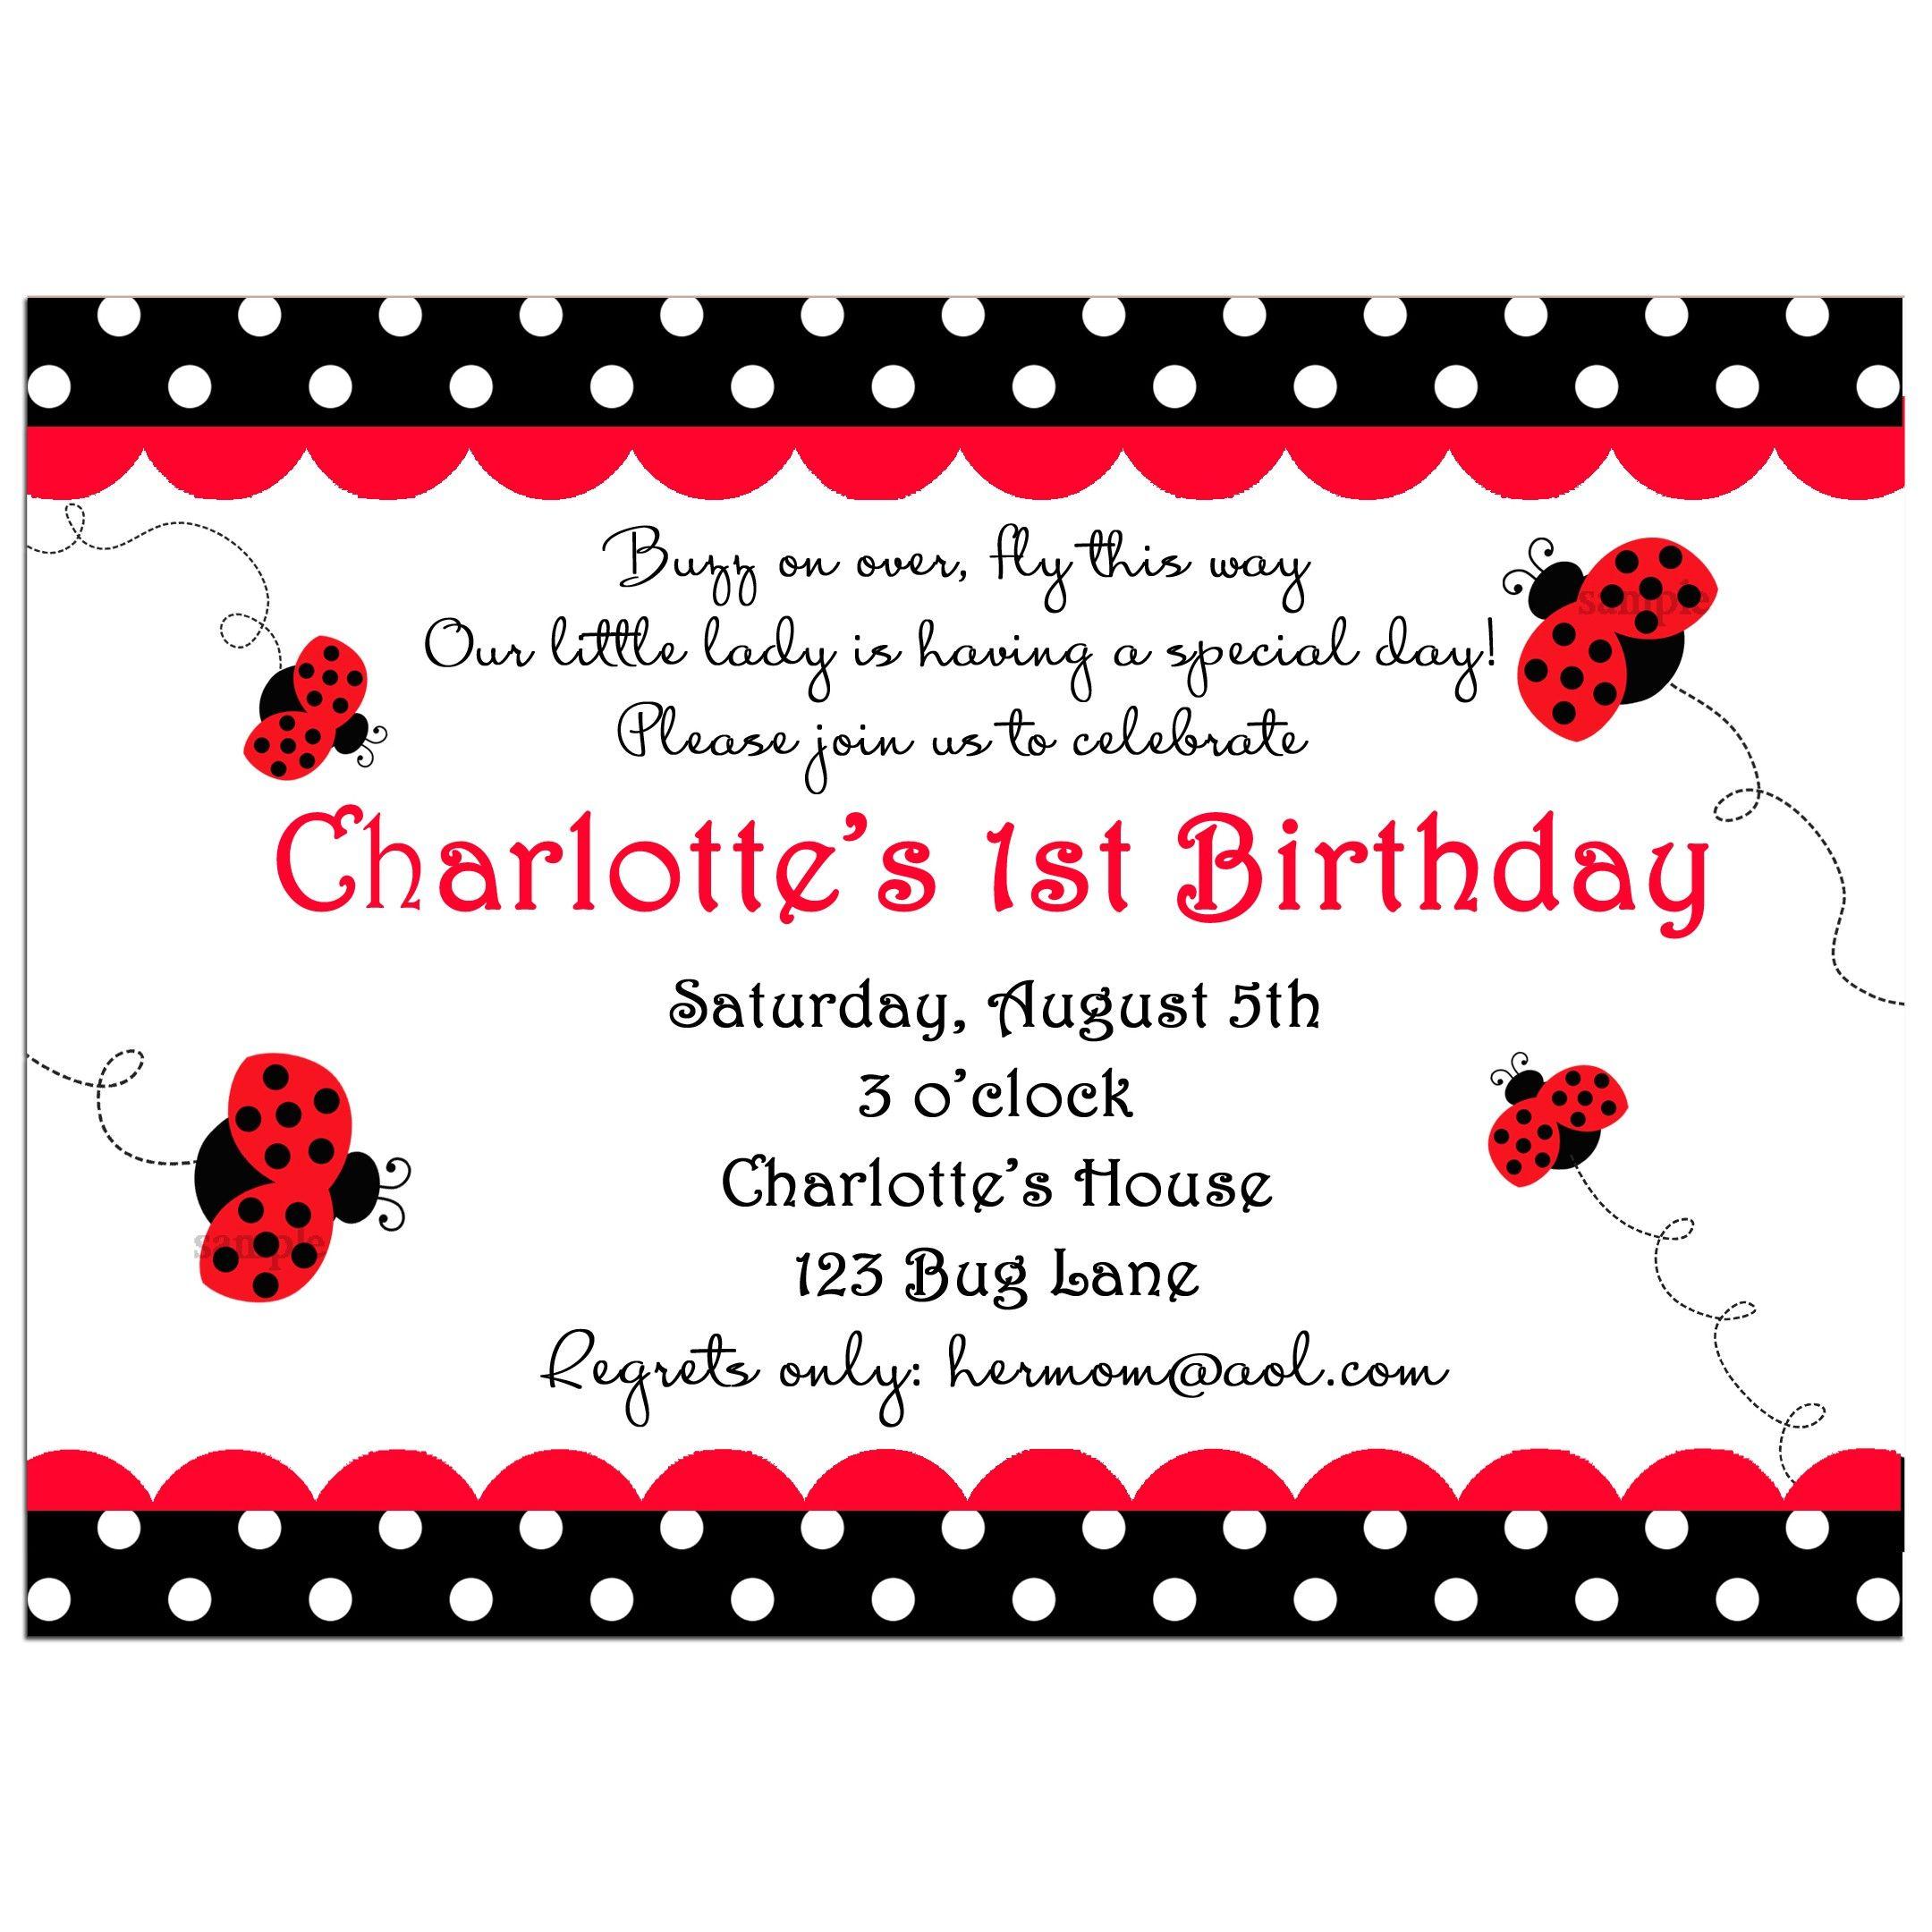 Ladybug Party Invitation - My Little Lady | Party Ideas | Pinterest ...